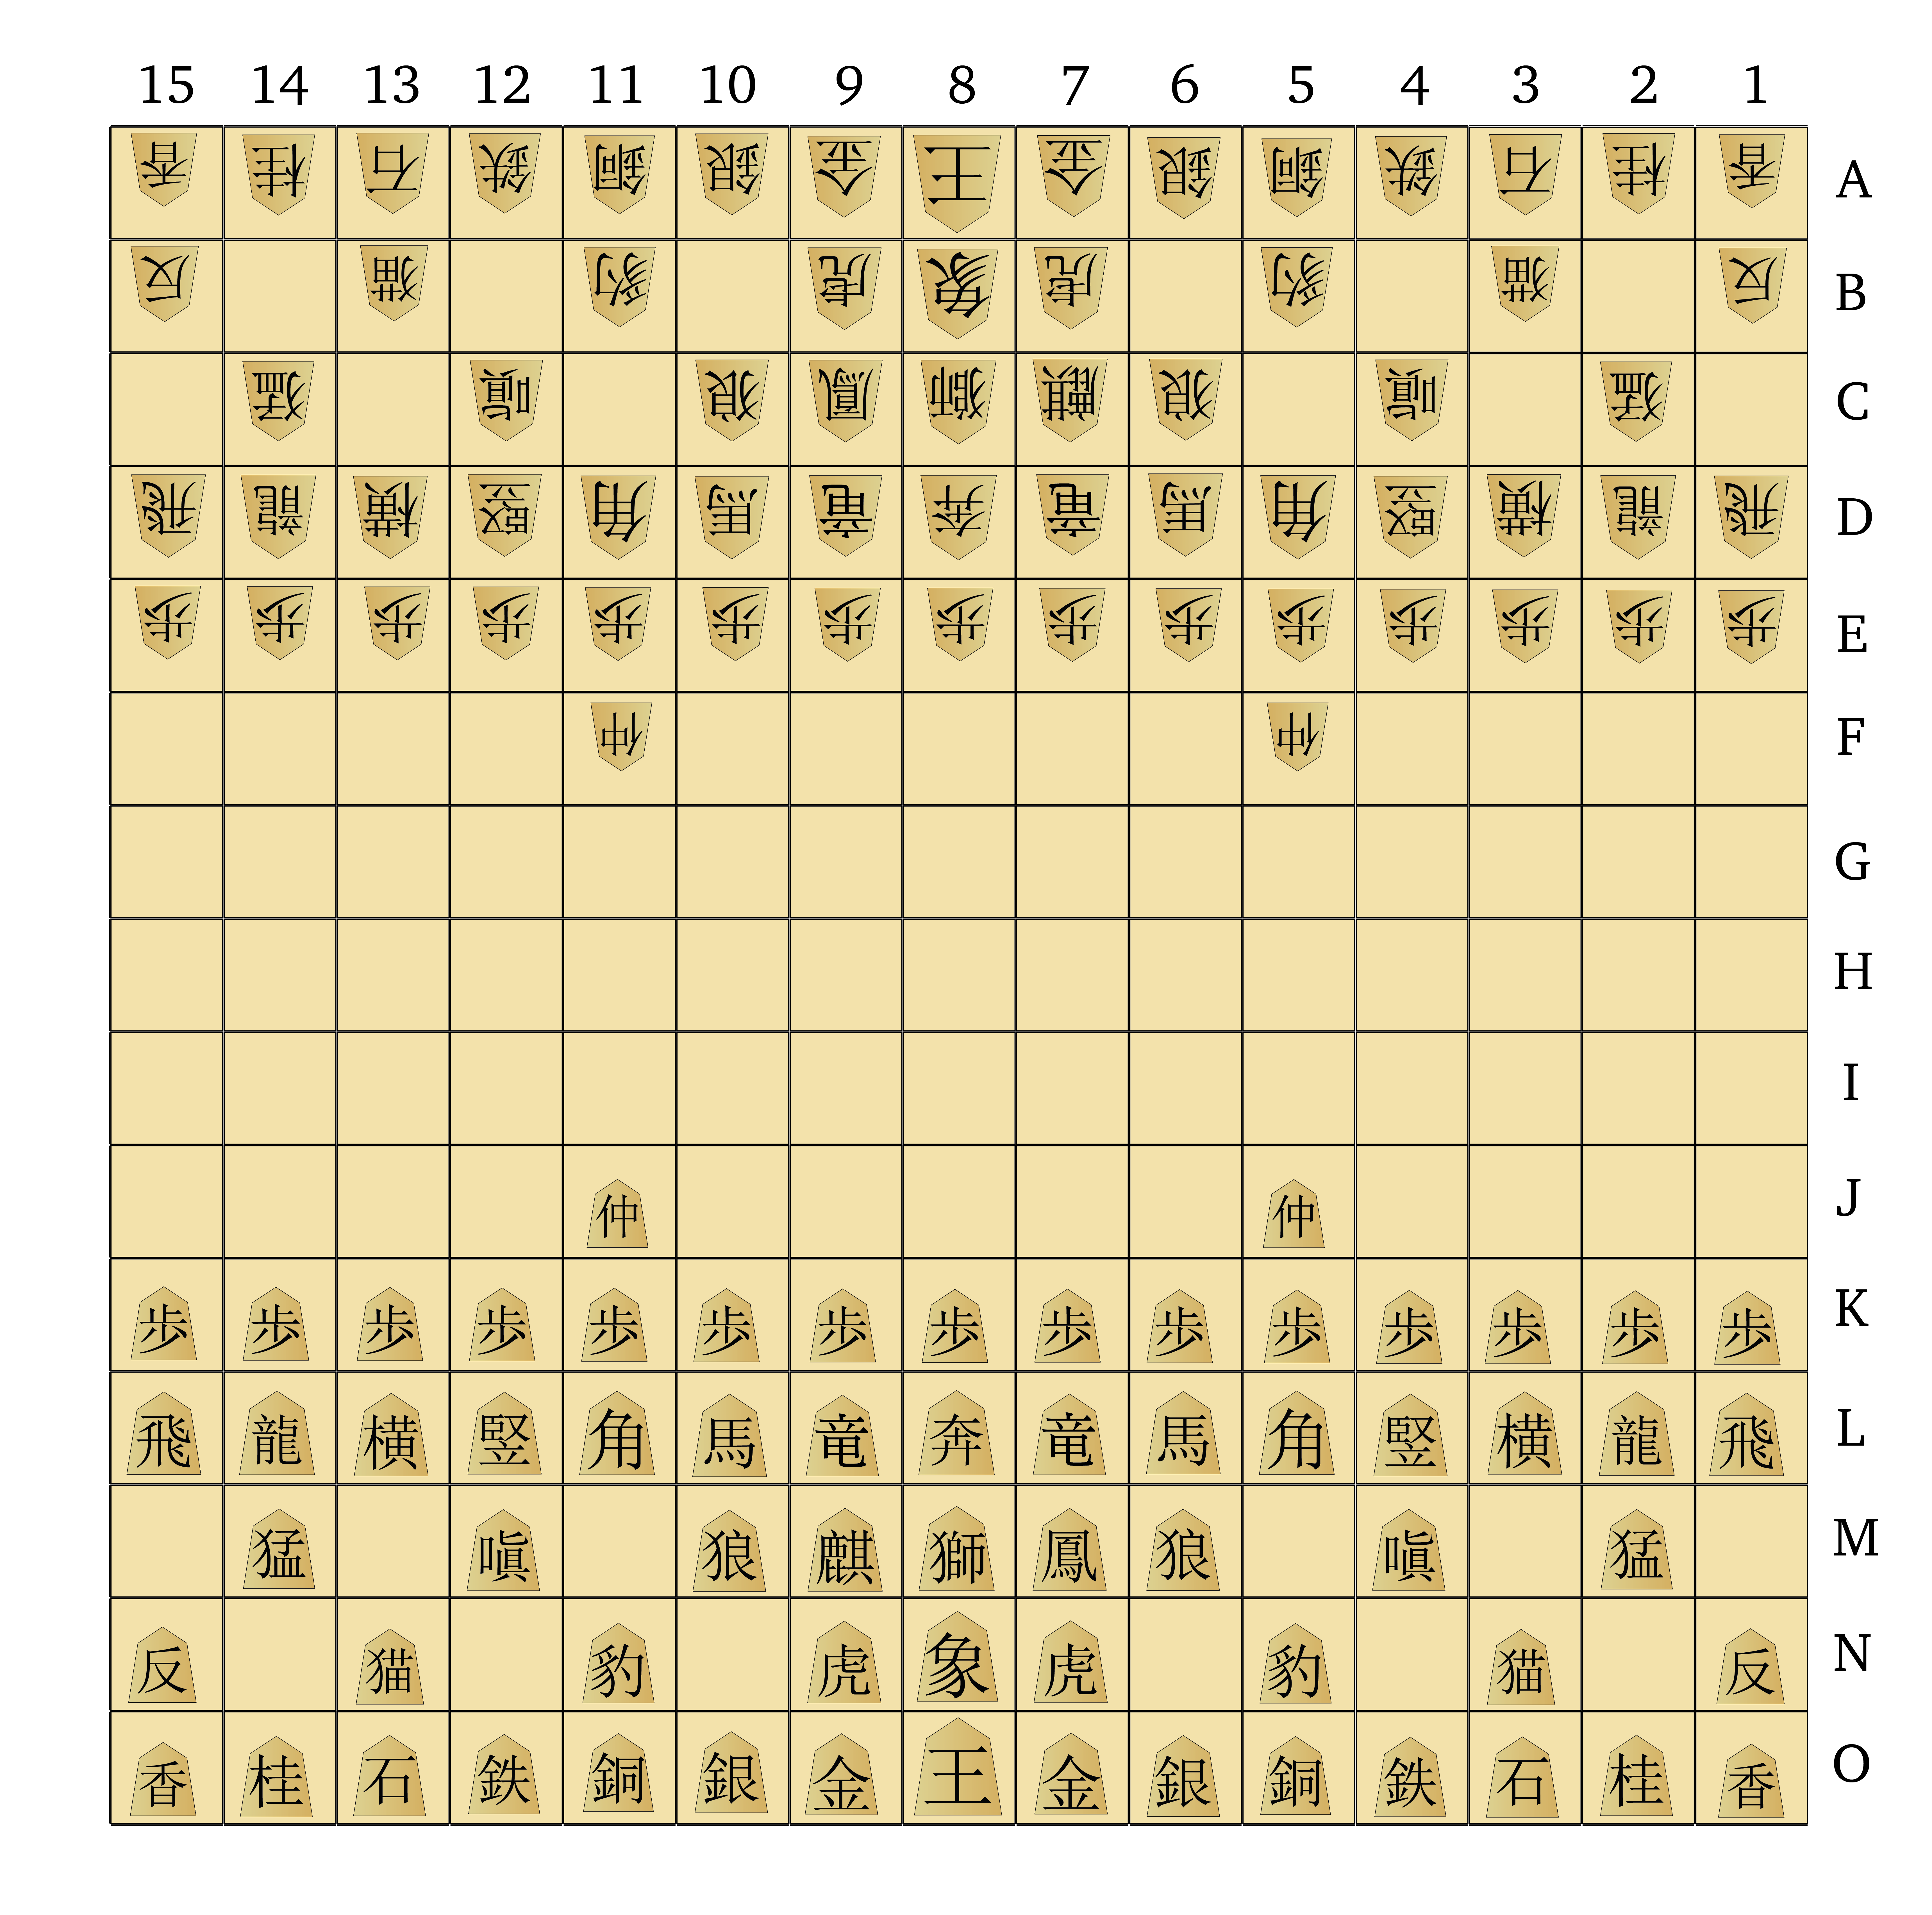 Dai Shogi 420 -- Move 0-01